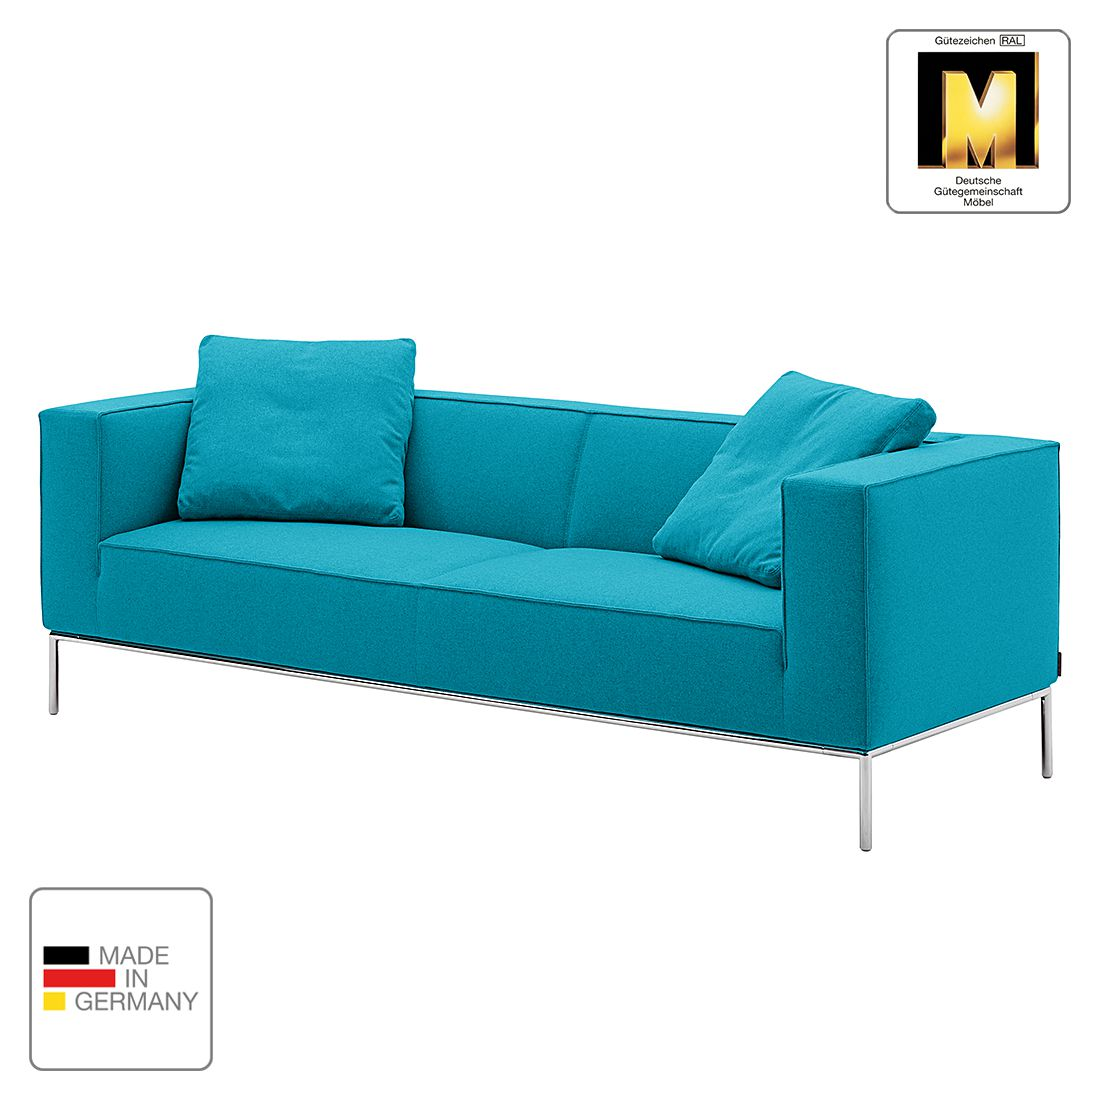 Sofa Greg (3-Sitzer) - Webstoff - Aqua - 2 Kissen, Machalke Polsterwerkstätten